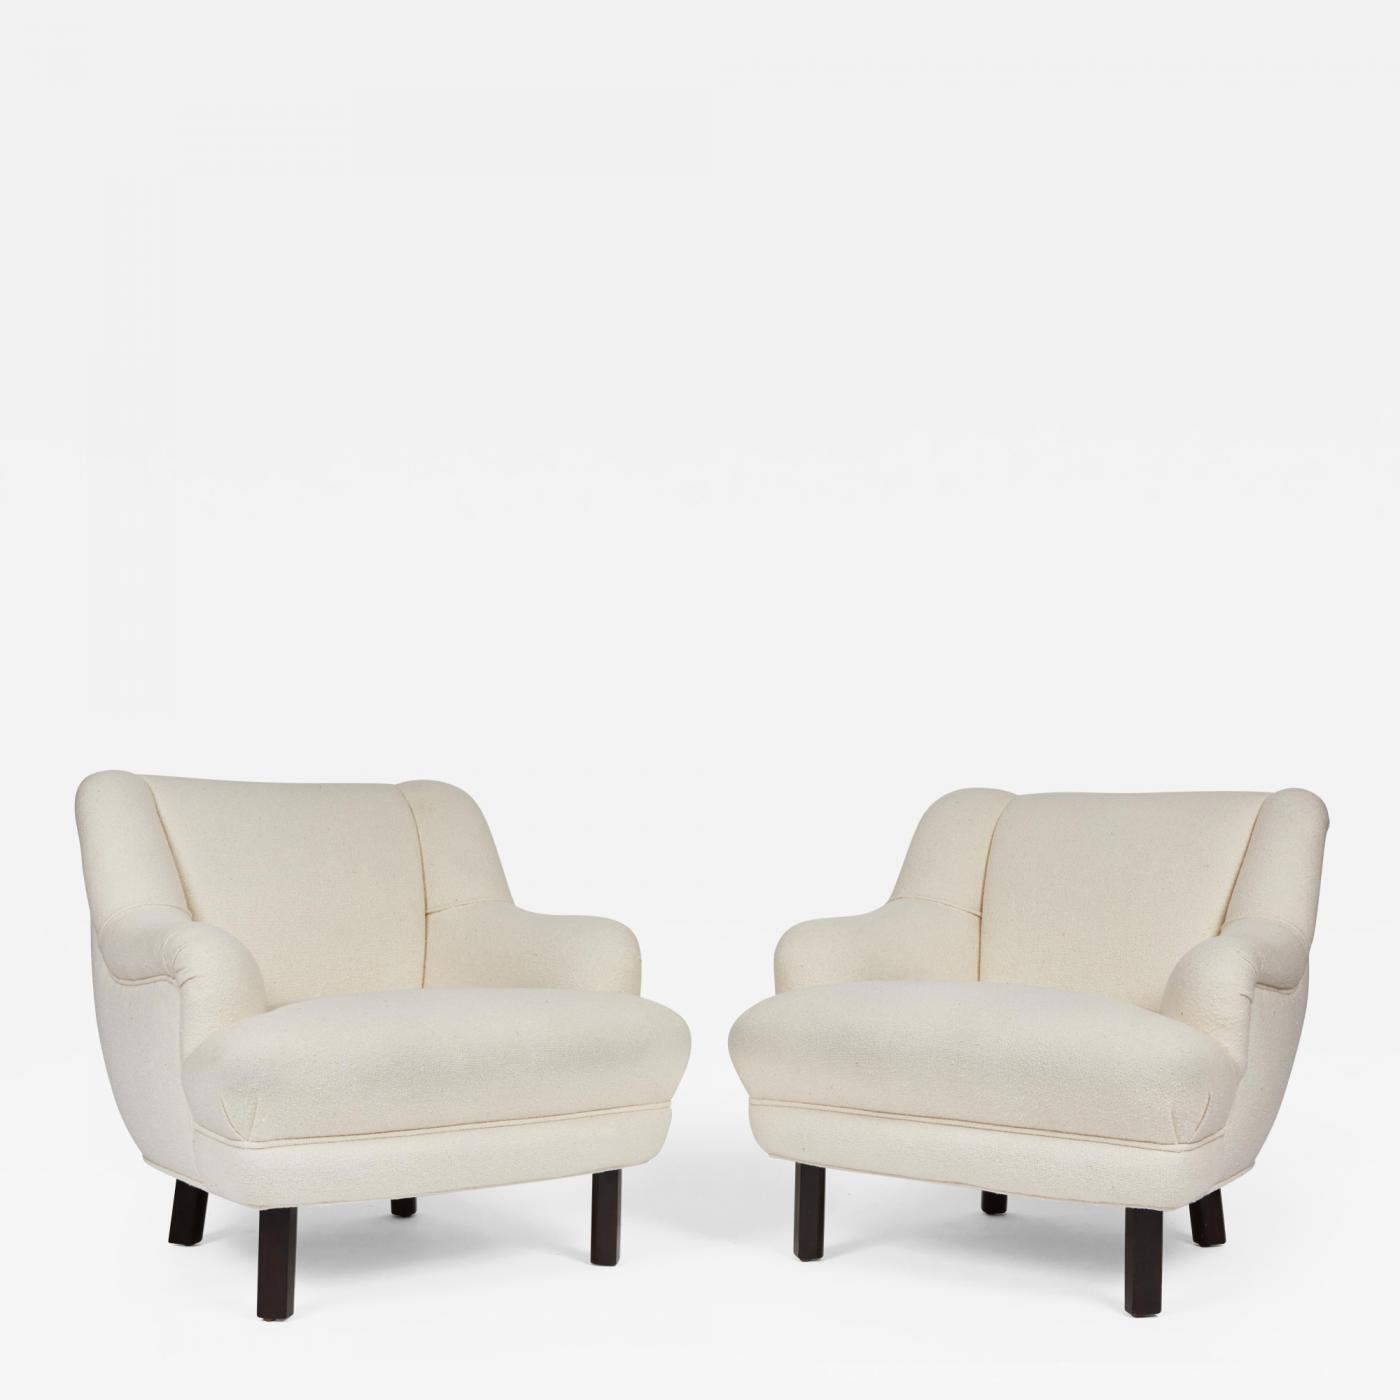 Genial Paul L Szl Pair Of Custom Paul L Szl Lounge Chairs